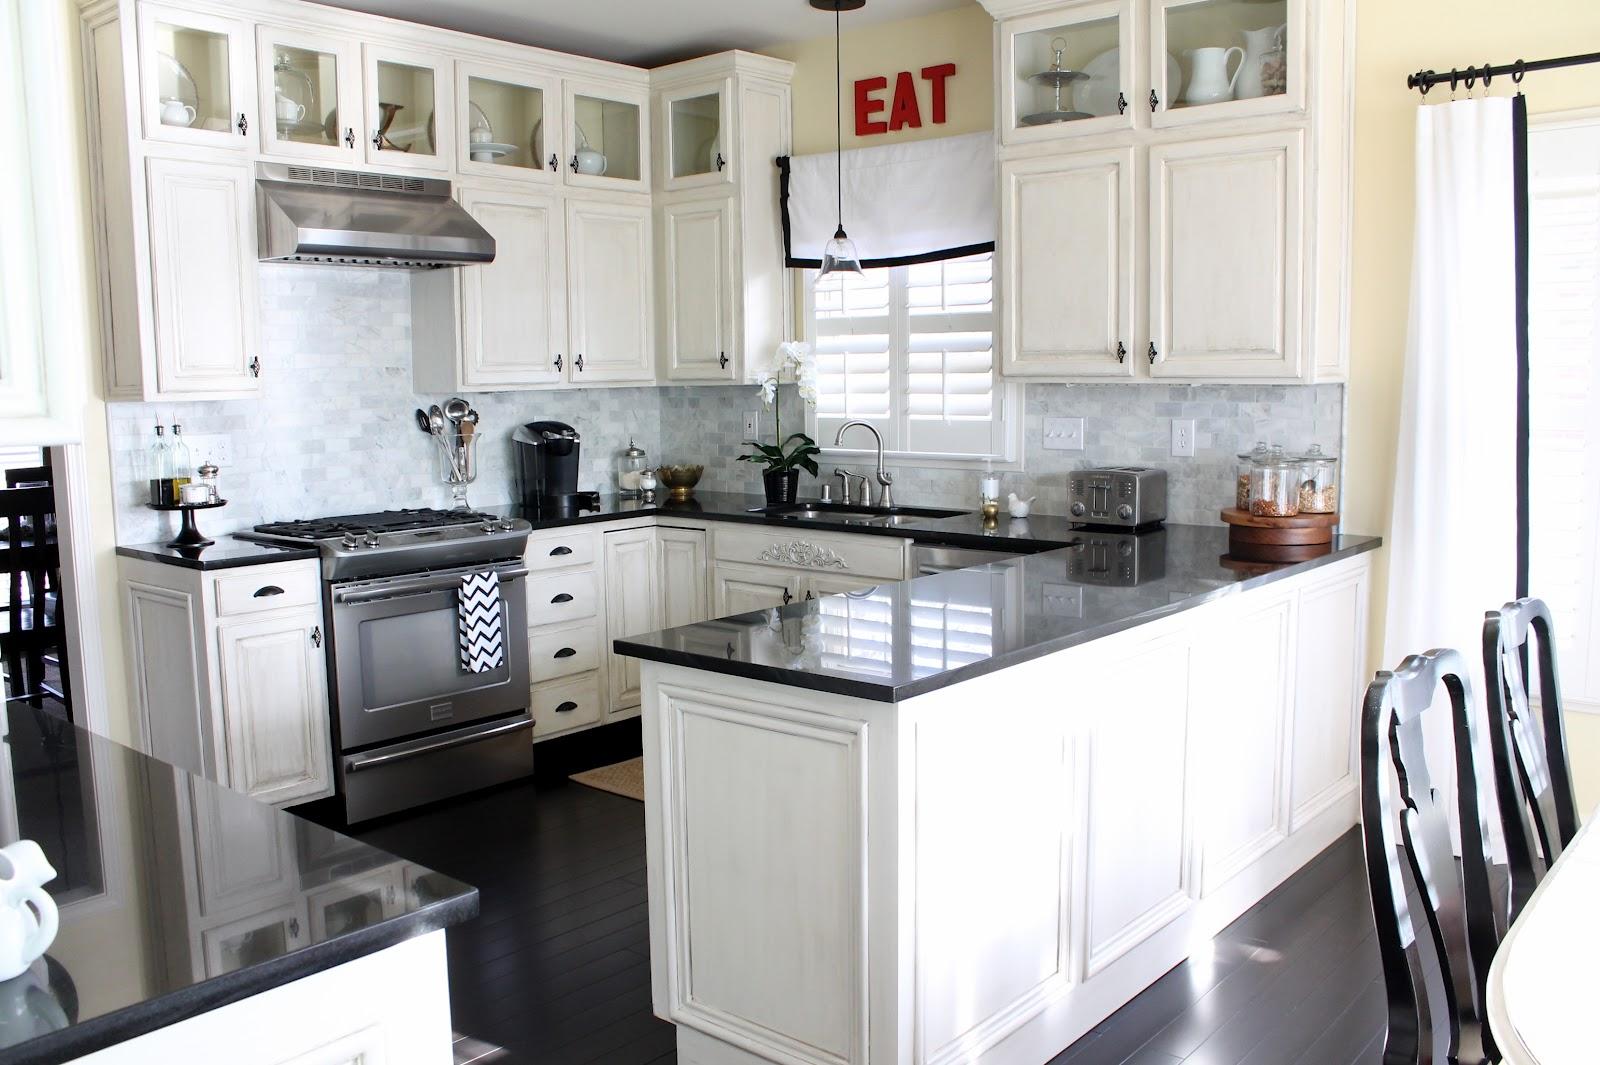 kitchen-white-cabinets-dark-countertops-photo-9